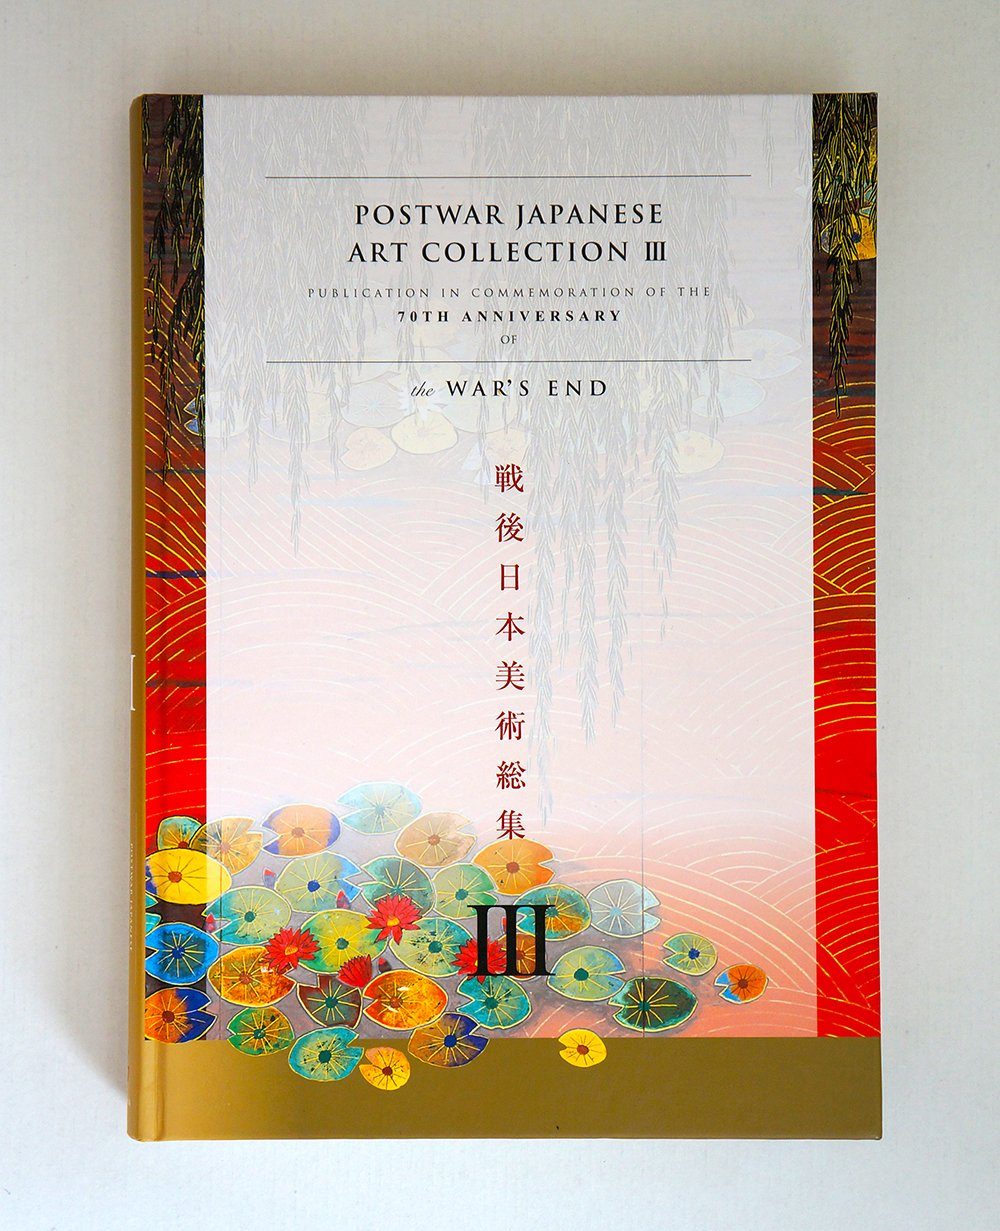 戦後美術総集Ⅲ(麗人社:2015年3月刊行)「野生の輝き」掲載